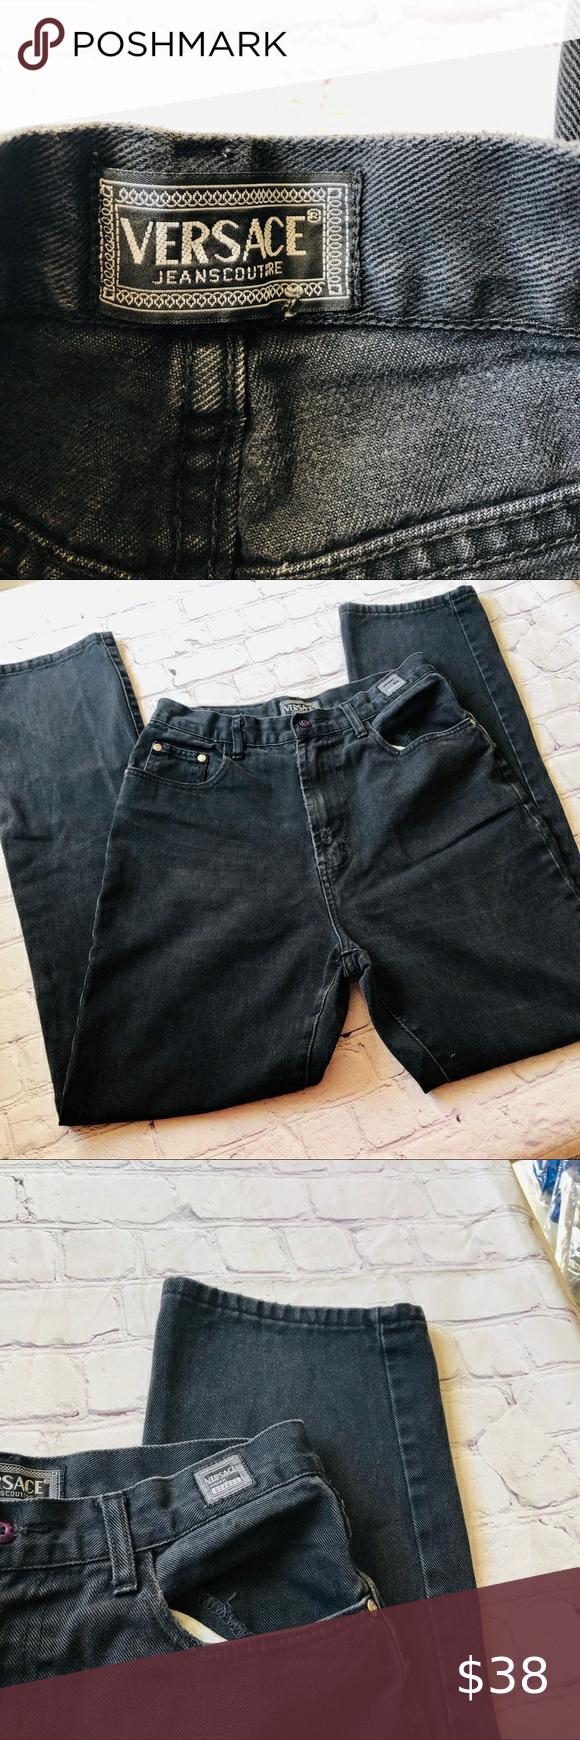 Versace Jeans Couture Distressed Black Denim 30 Denim Design Black Denim Versace Jeans Couture